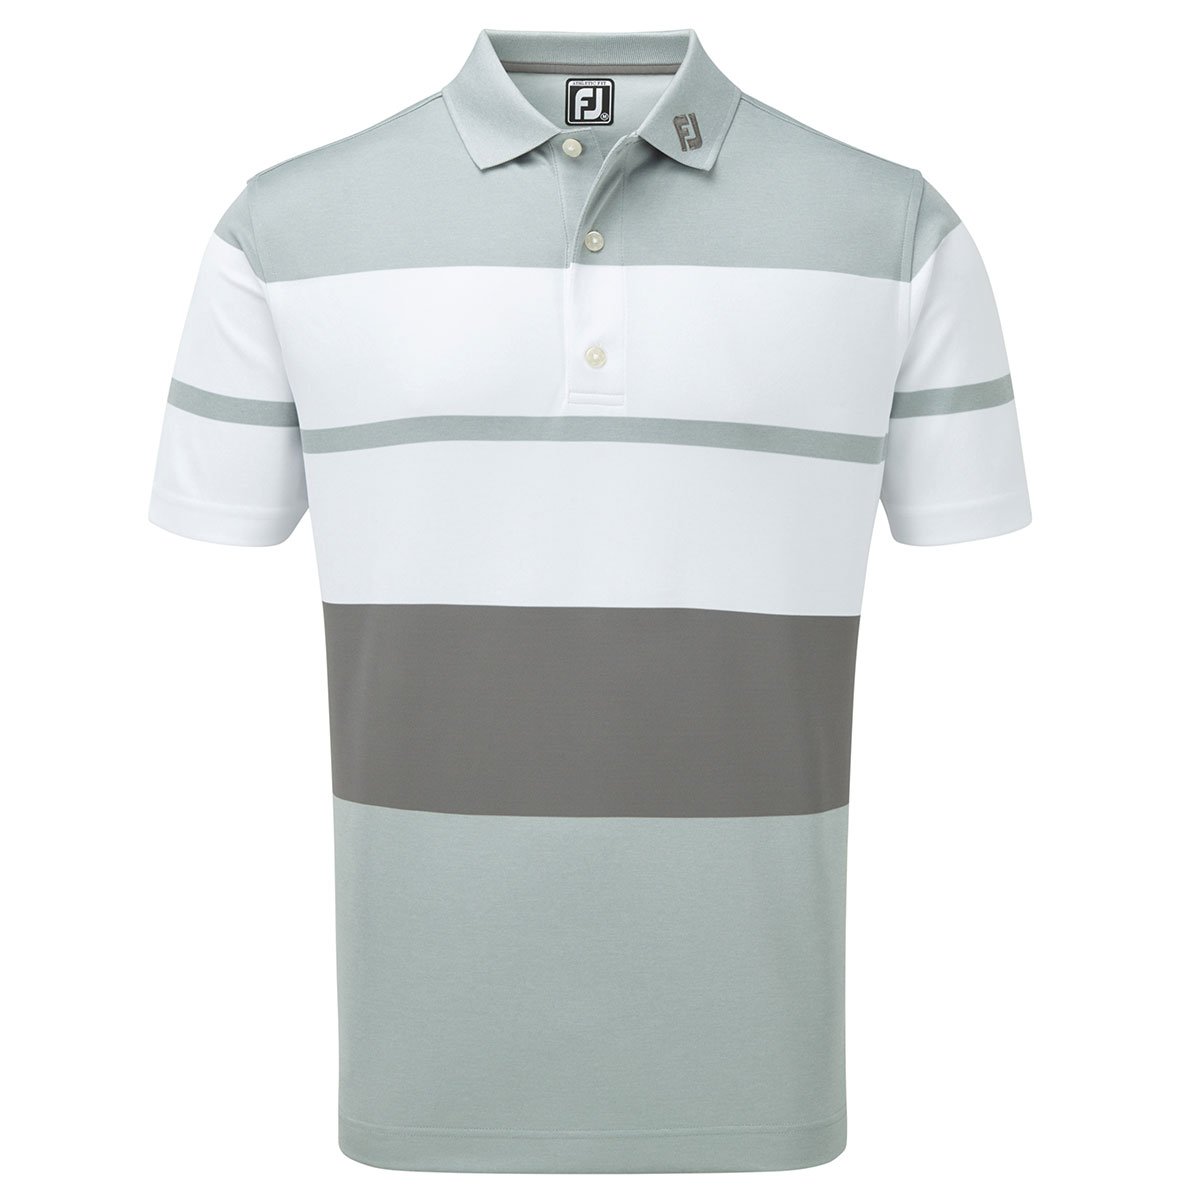 691b7804 FootJoy Stripe Block Smooth Polo Shirt from american golf